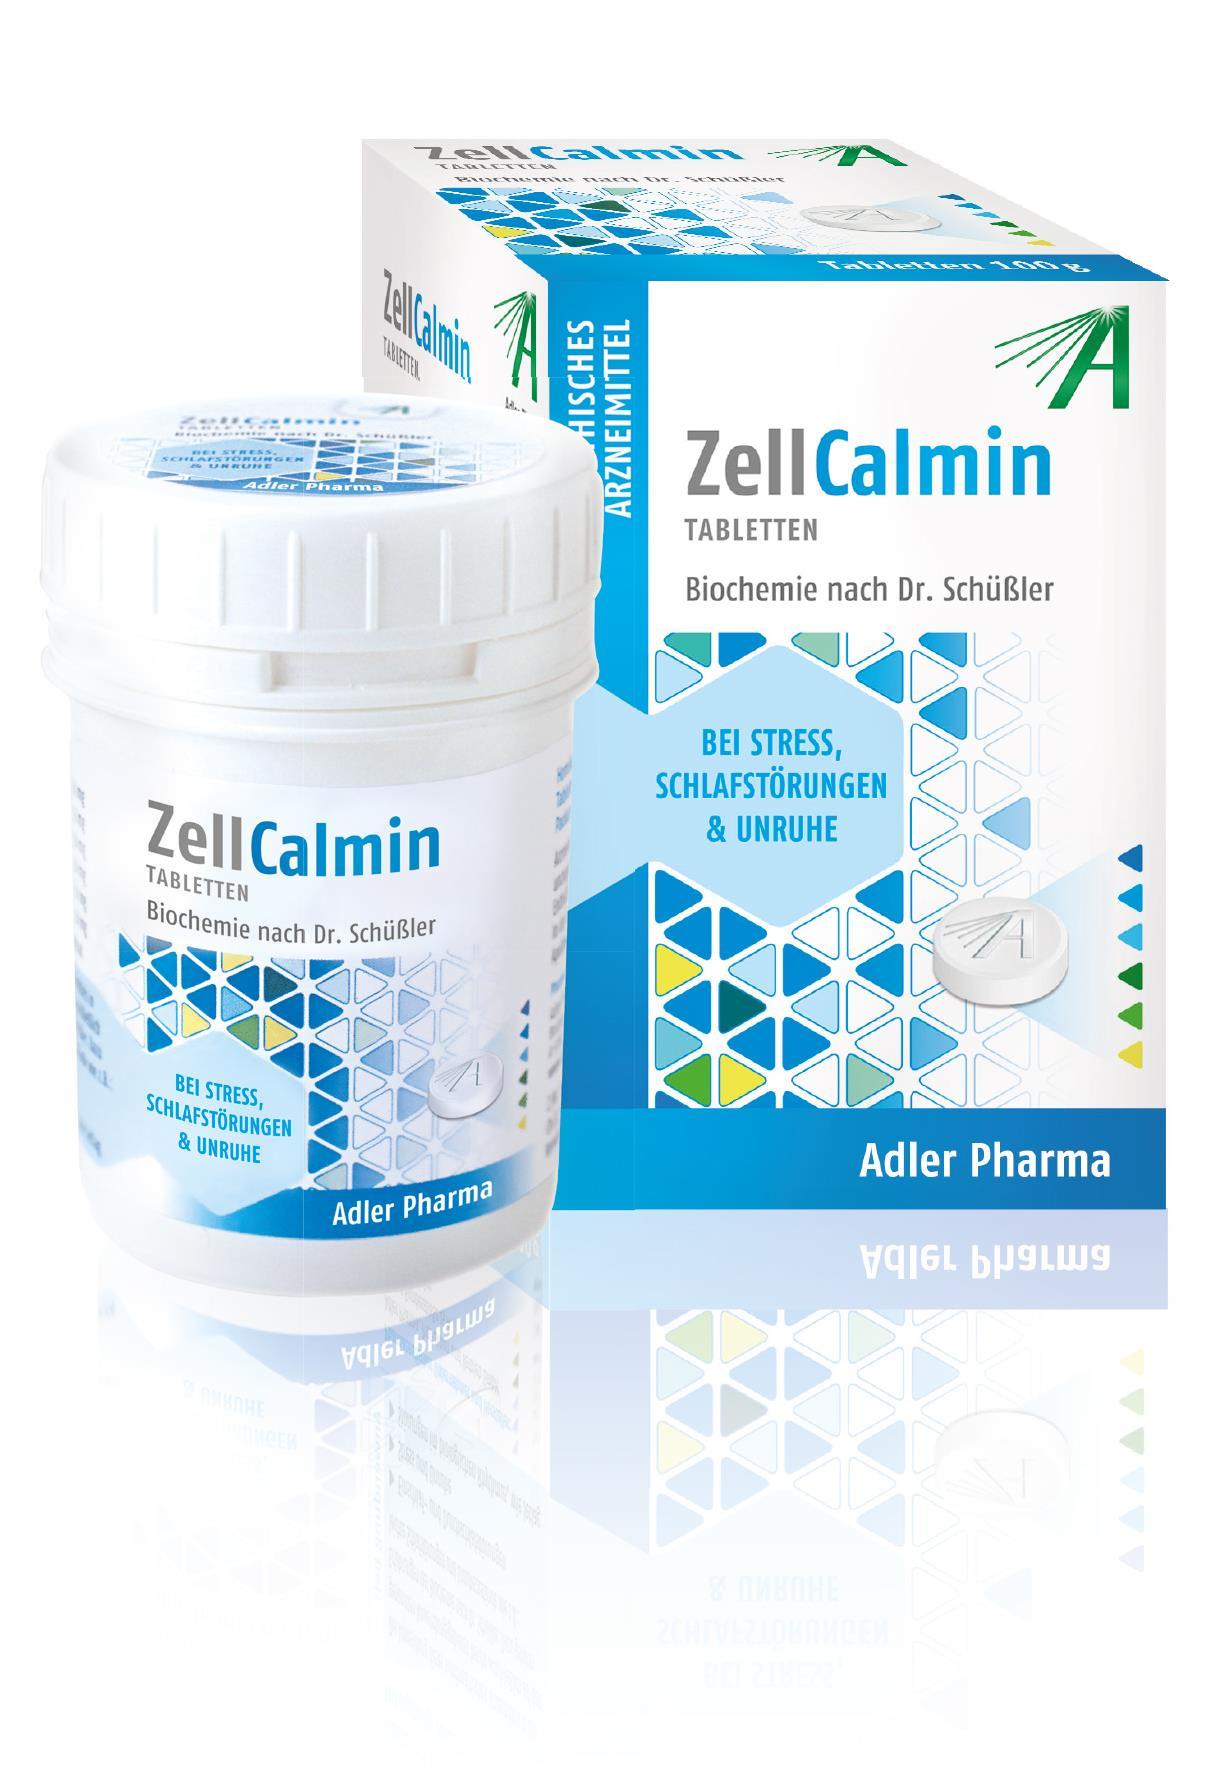 Biochemie nach Dr. Schüssler Zell Calmin - Tabletten